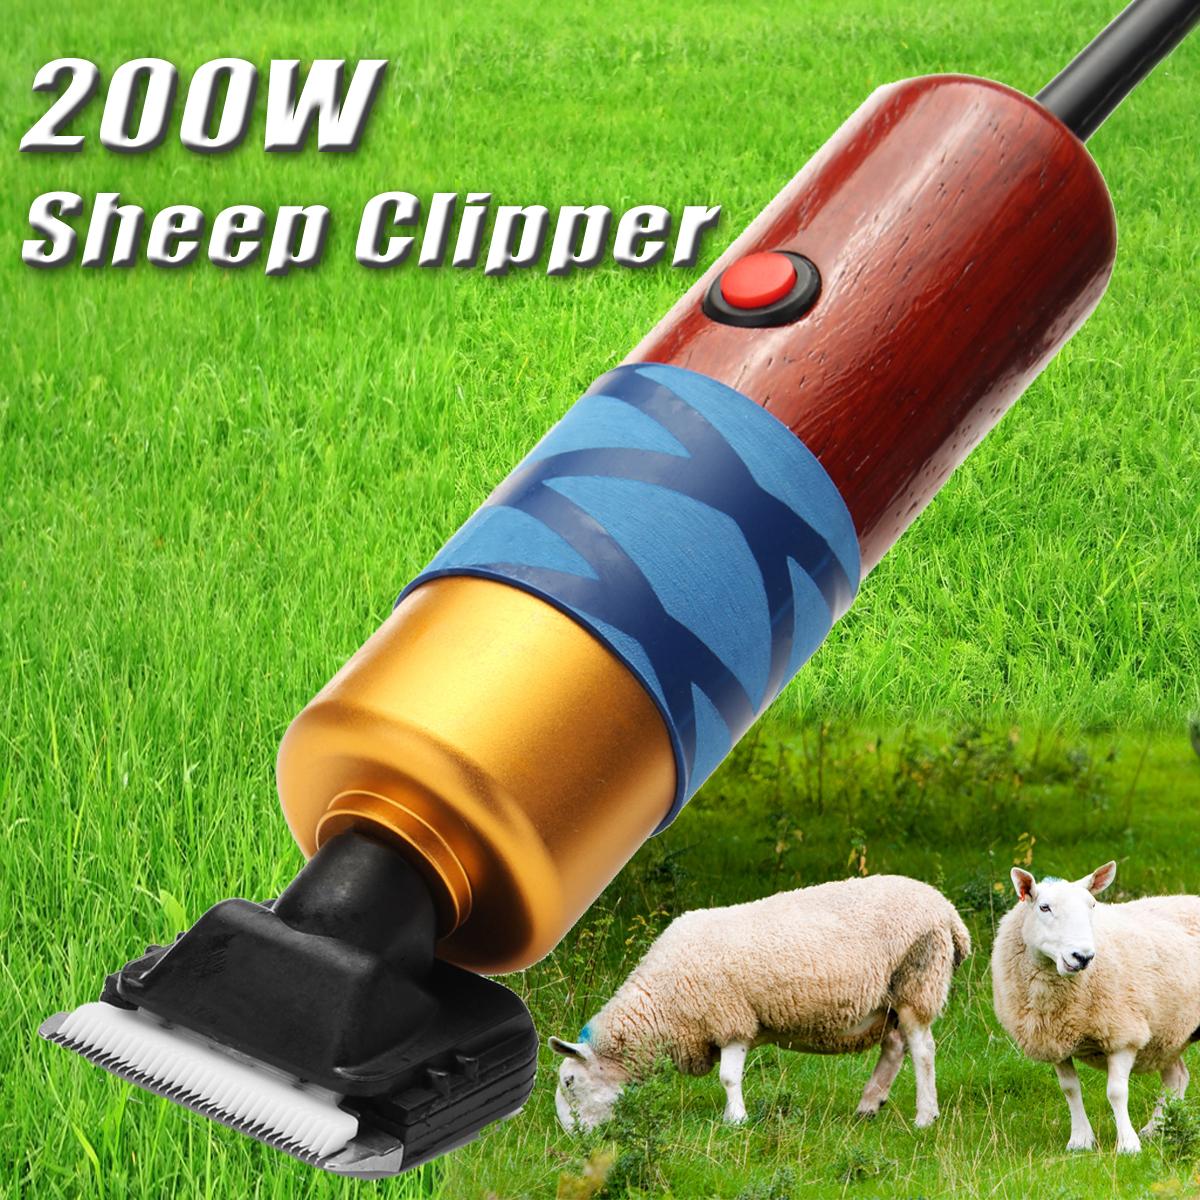 Electric Large Farm Sheep Supplies Goat Shears Animal Shearing Grooming Clipper